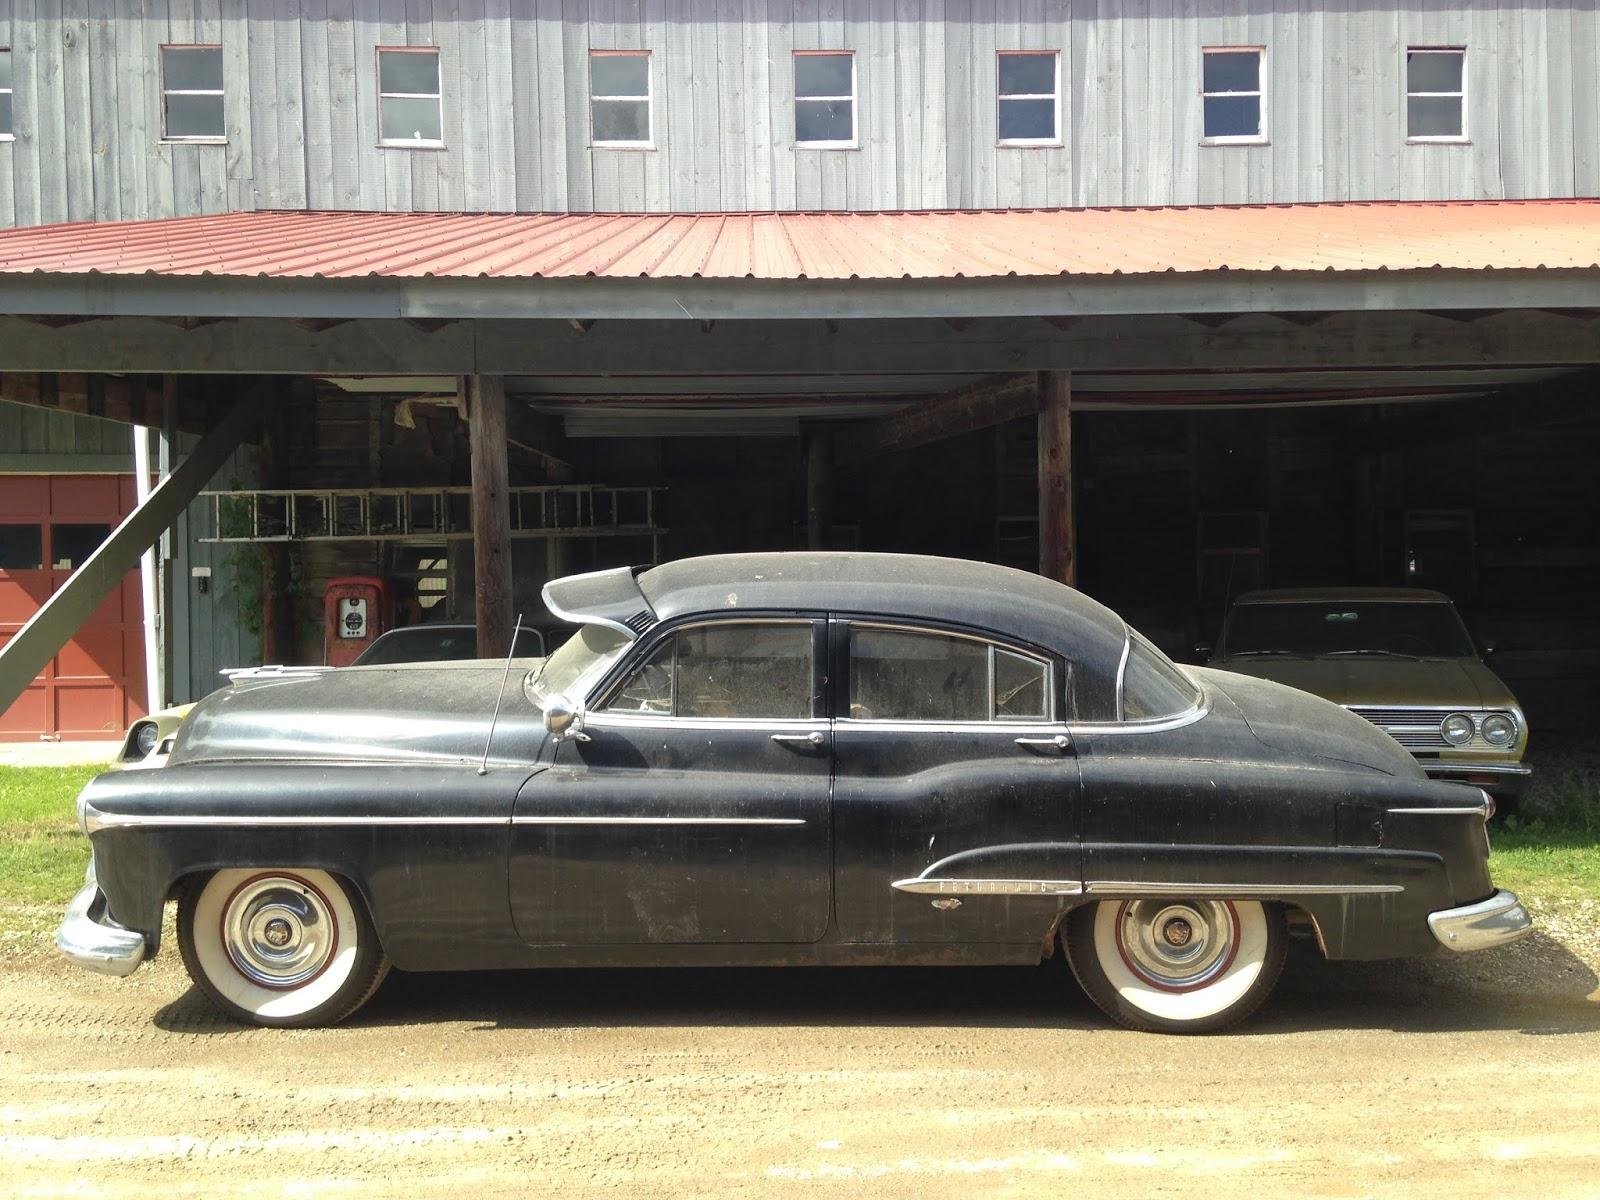 1950 Oldsmobile 98 Futuramic Freeport Maine The Car Looks Original A Barn Find